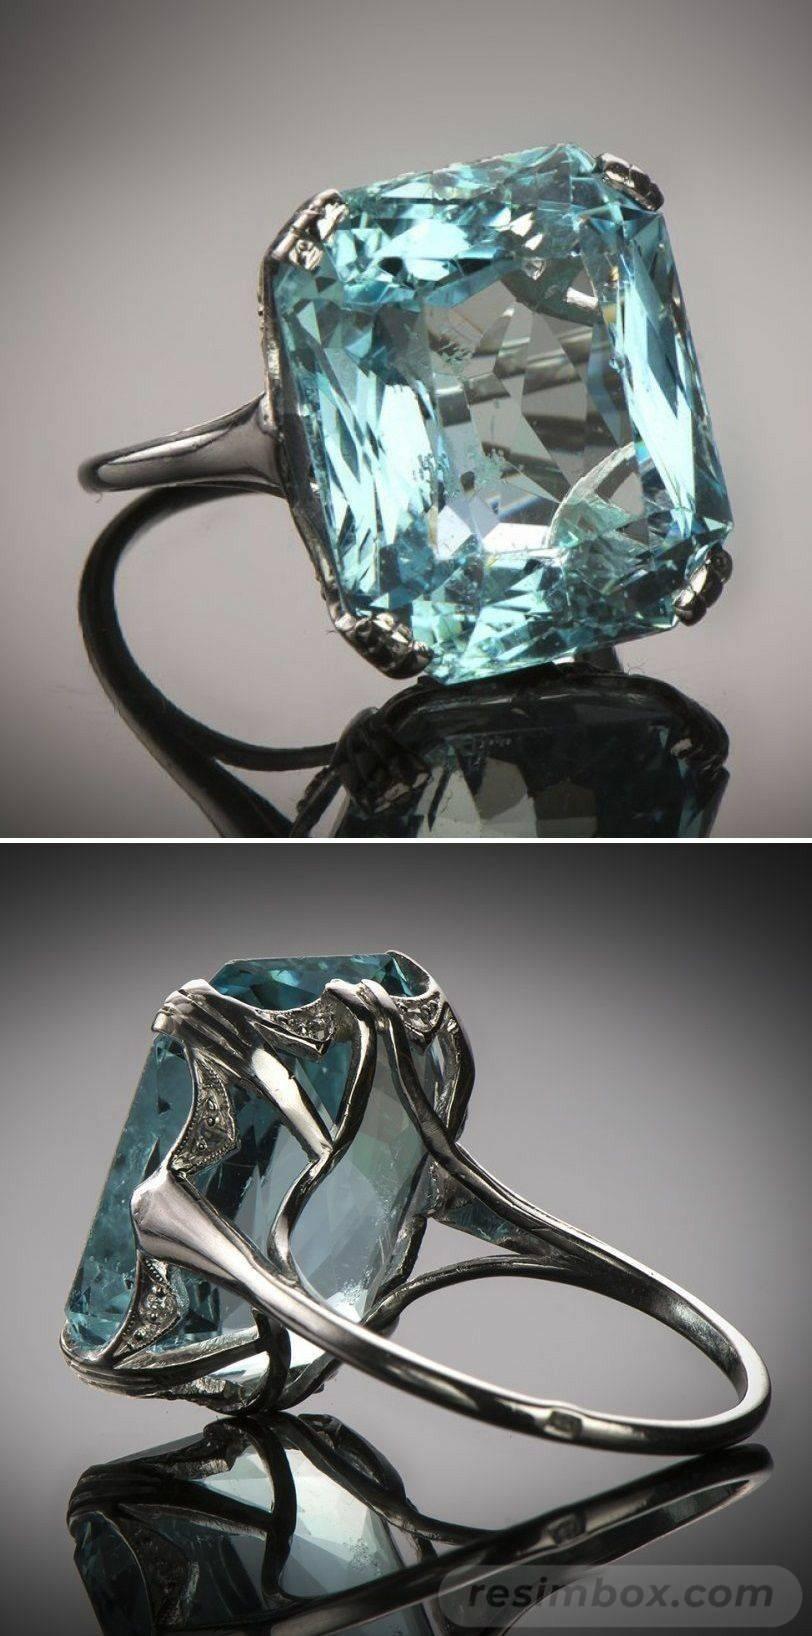 Art deco engagement ring-AUgs8kt7BPP7-WDgV7EQqryydMFhuDEuSaVgd3KuEX3USx2T7X_ZOgE